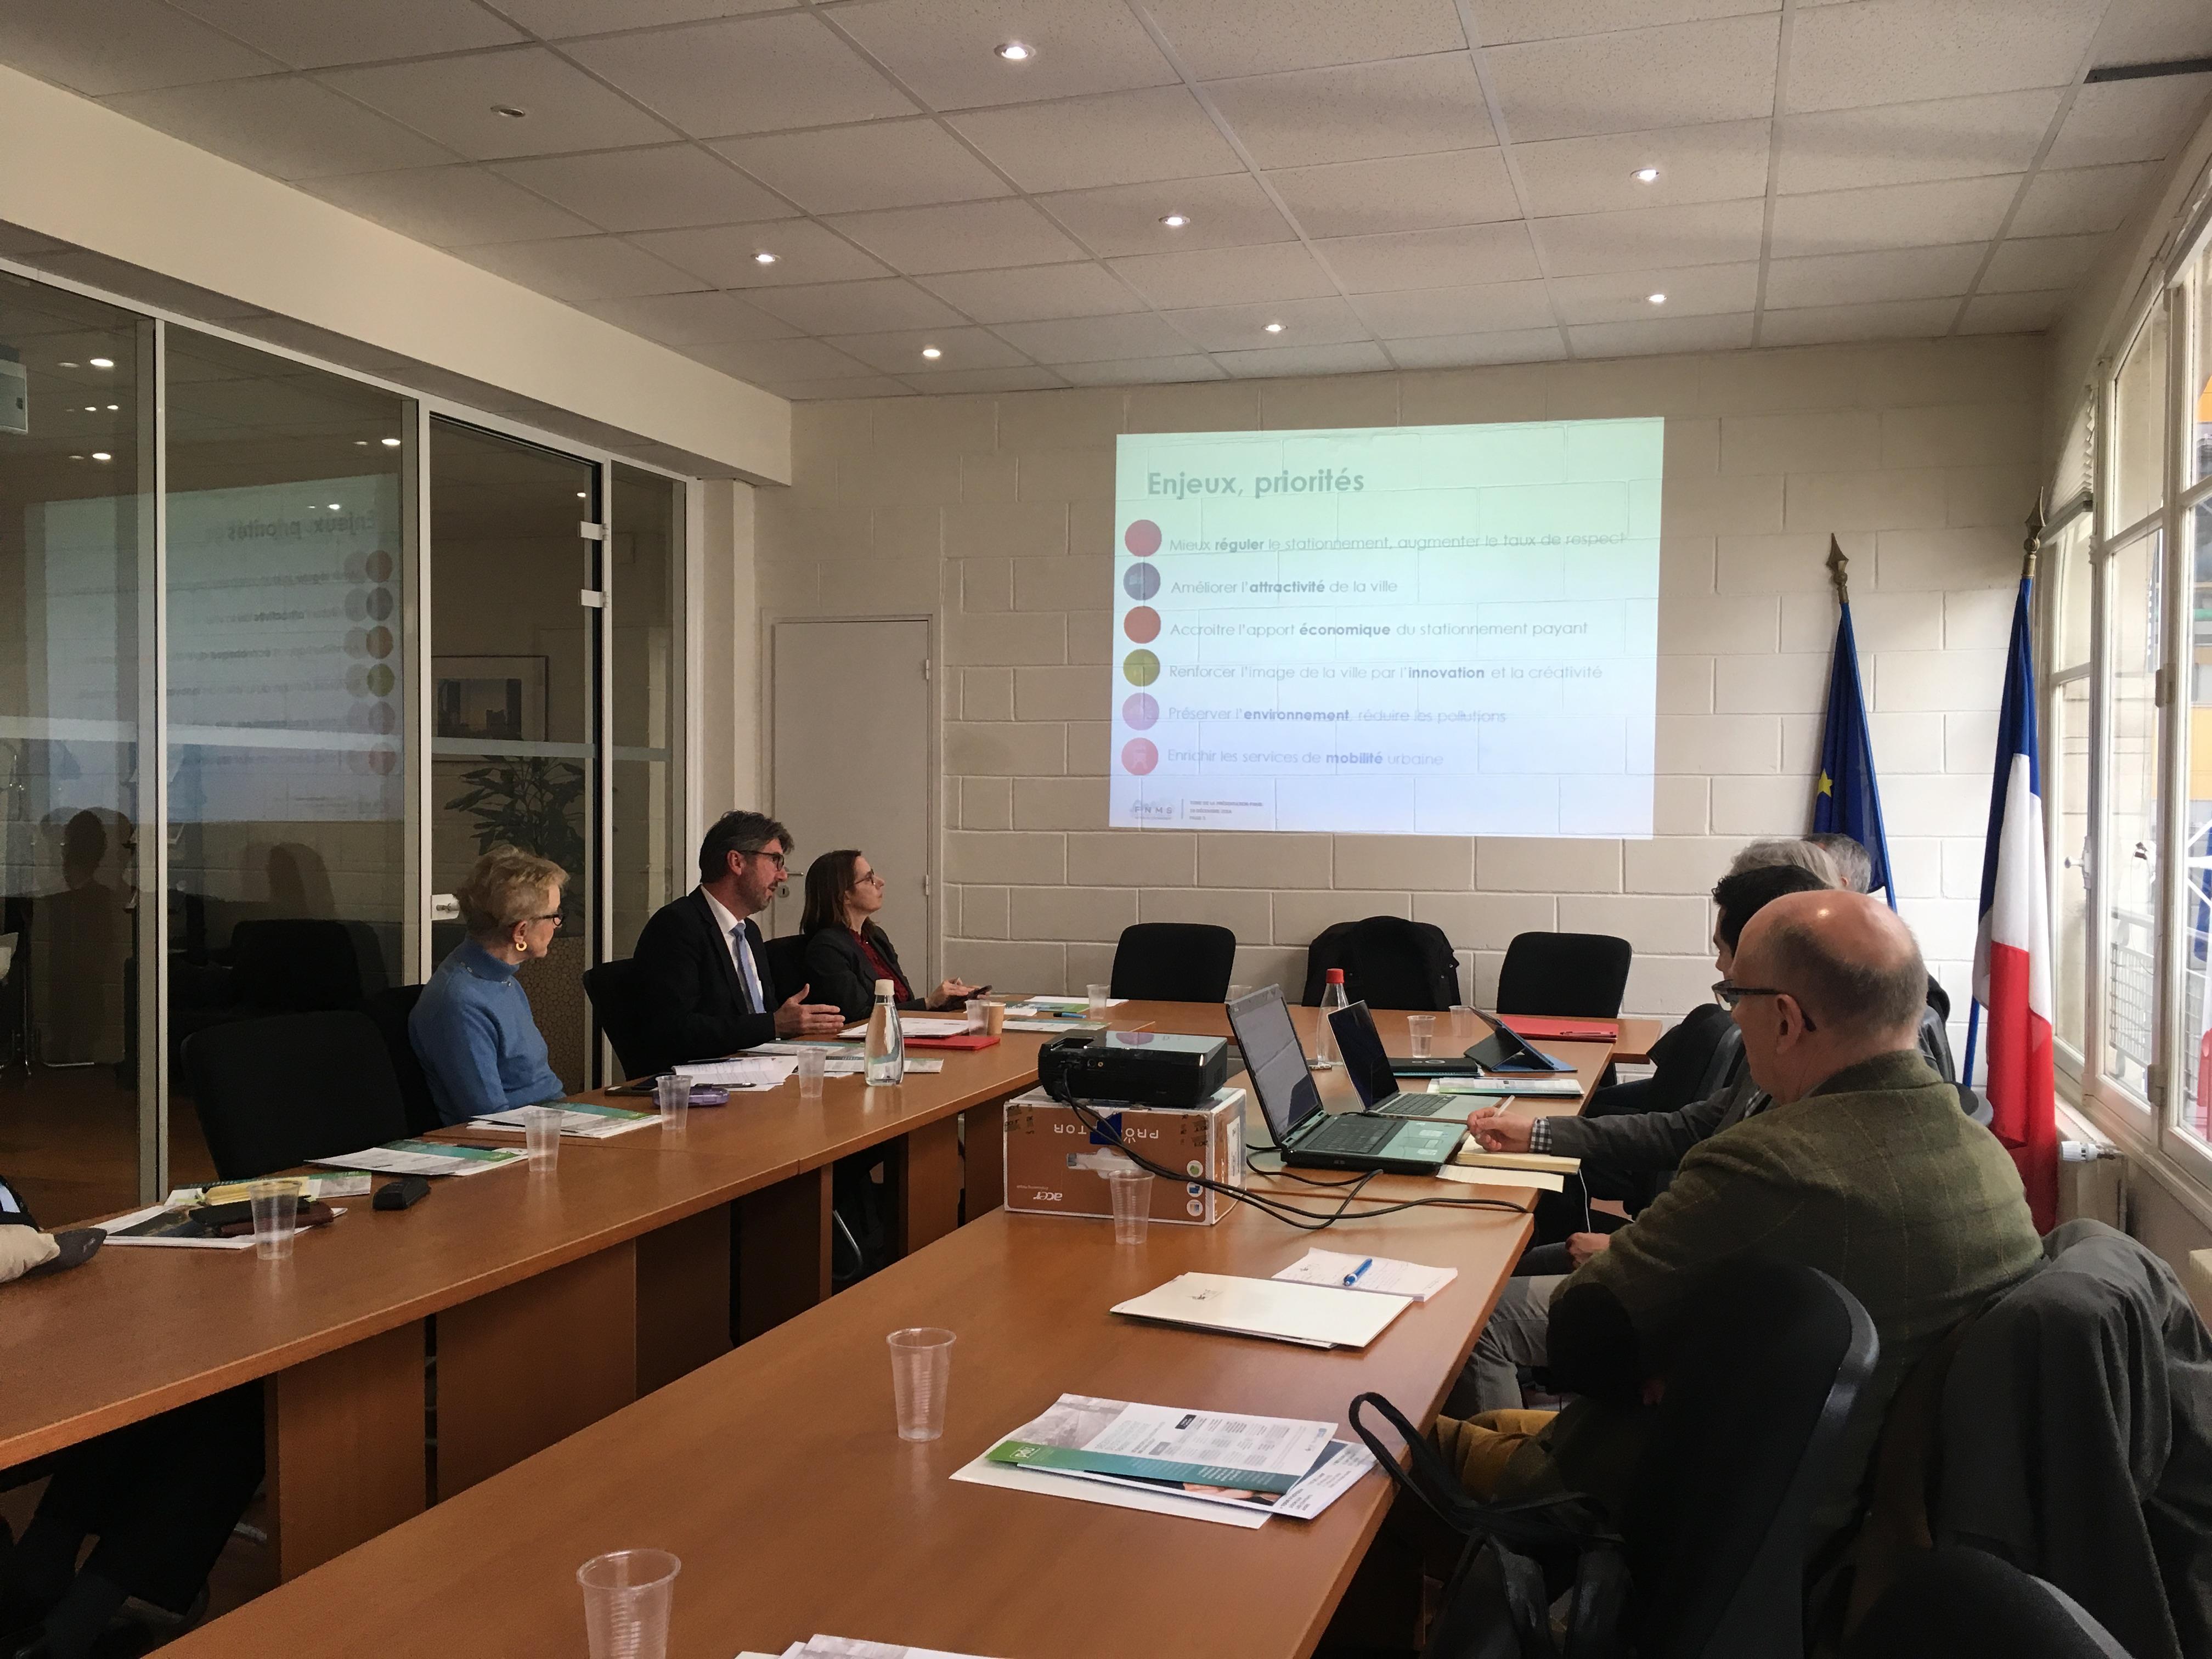 Commission Transports - Séance 2 - Lundi 20 novembre 2017 - 14h-16h